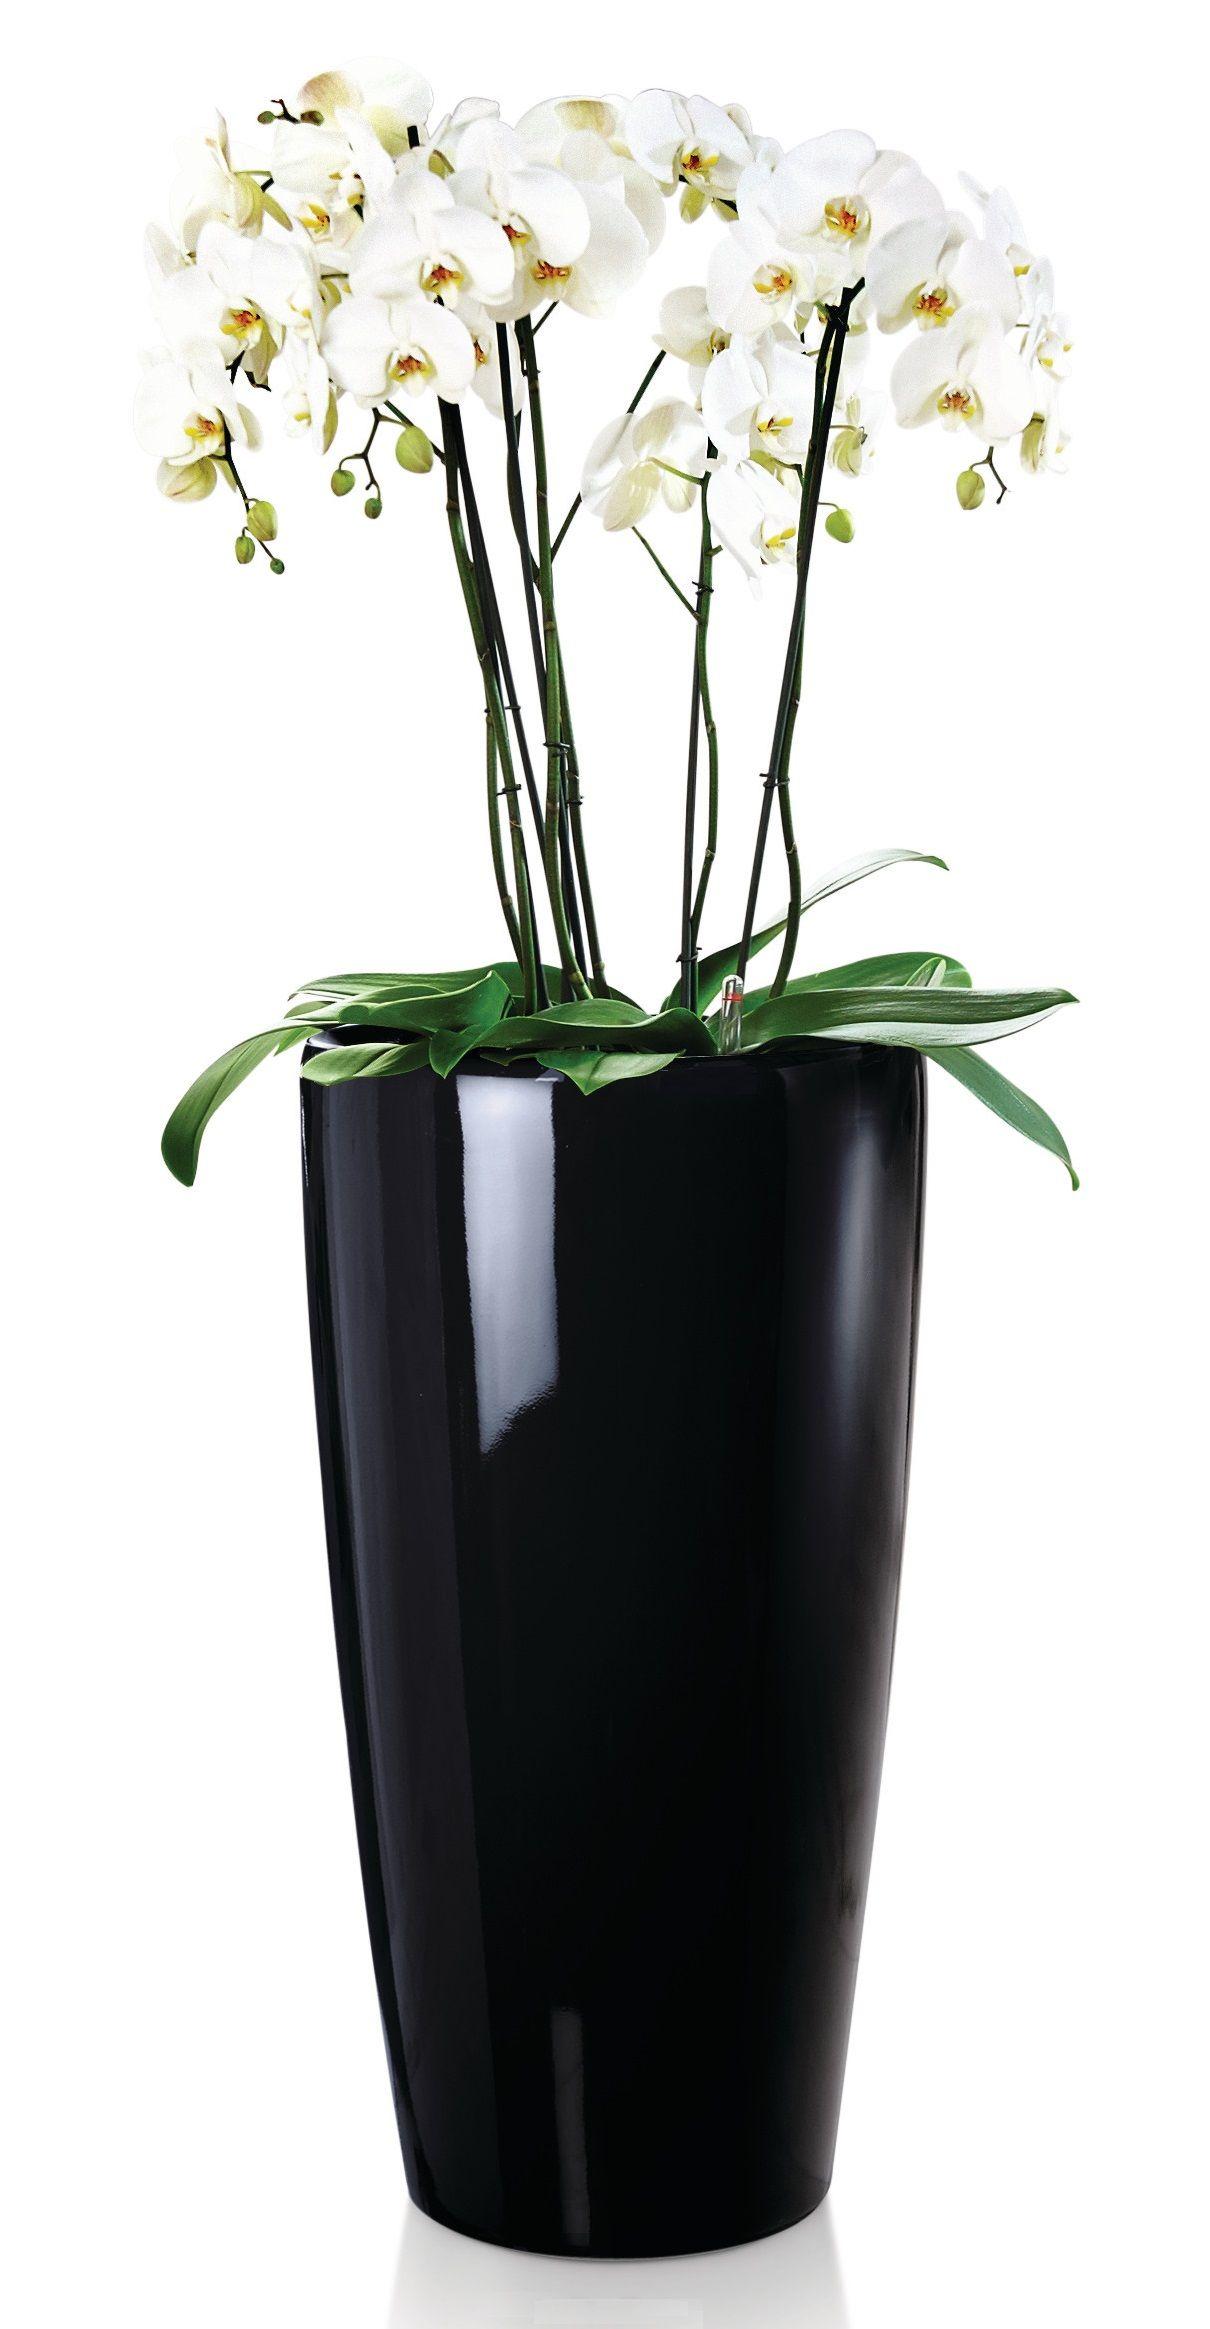 Correze Comtemporary Sleek Black Planter With Orchid